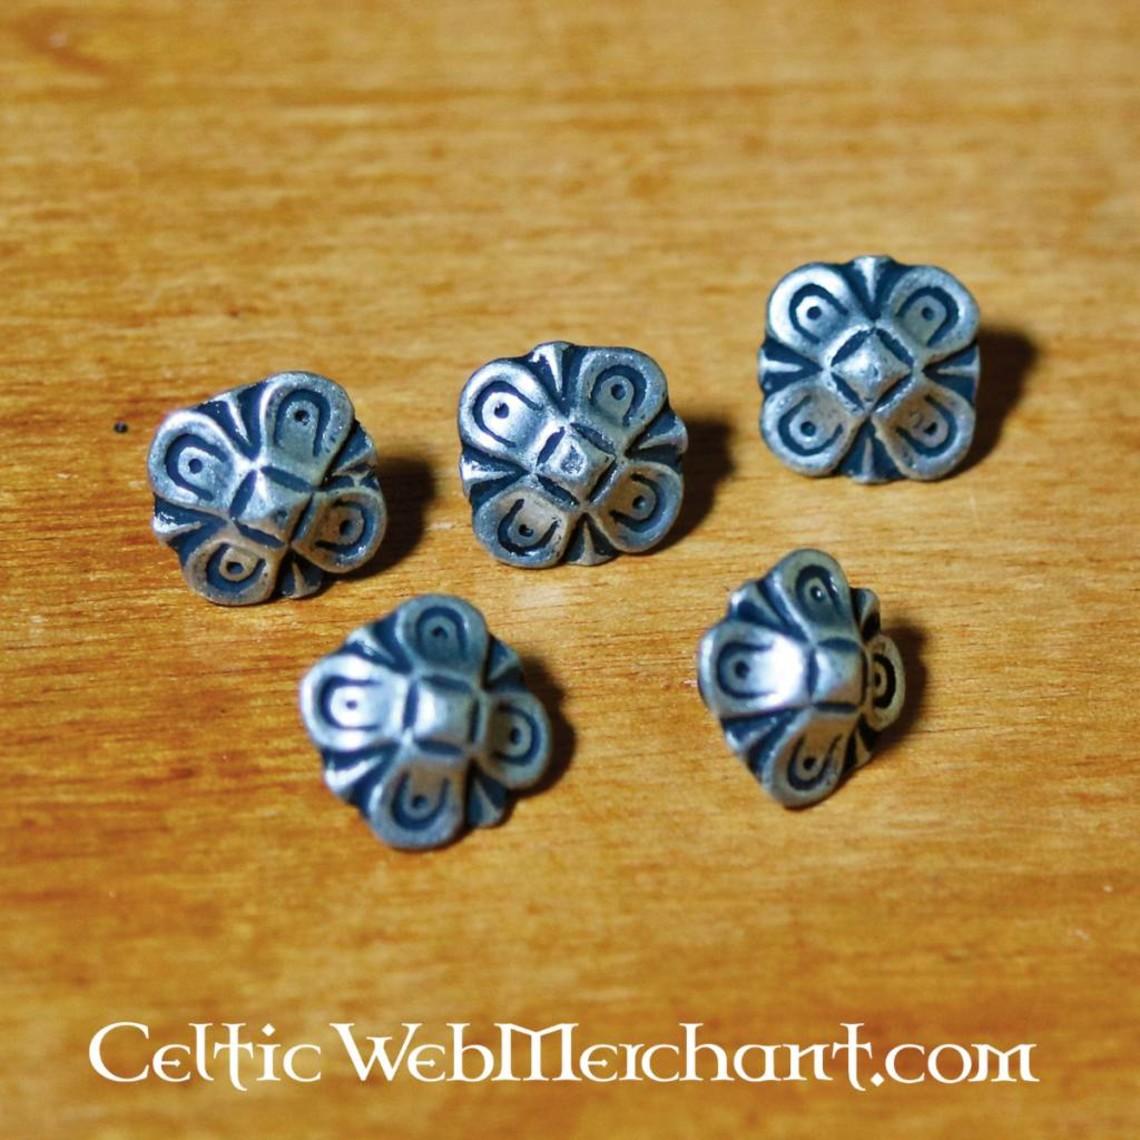 Accessori per cintura Oktogon (5 pezzi), argentati